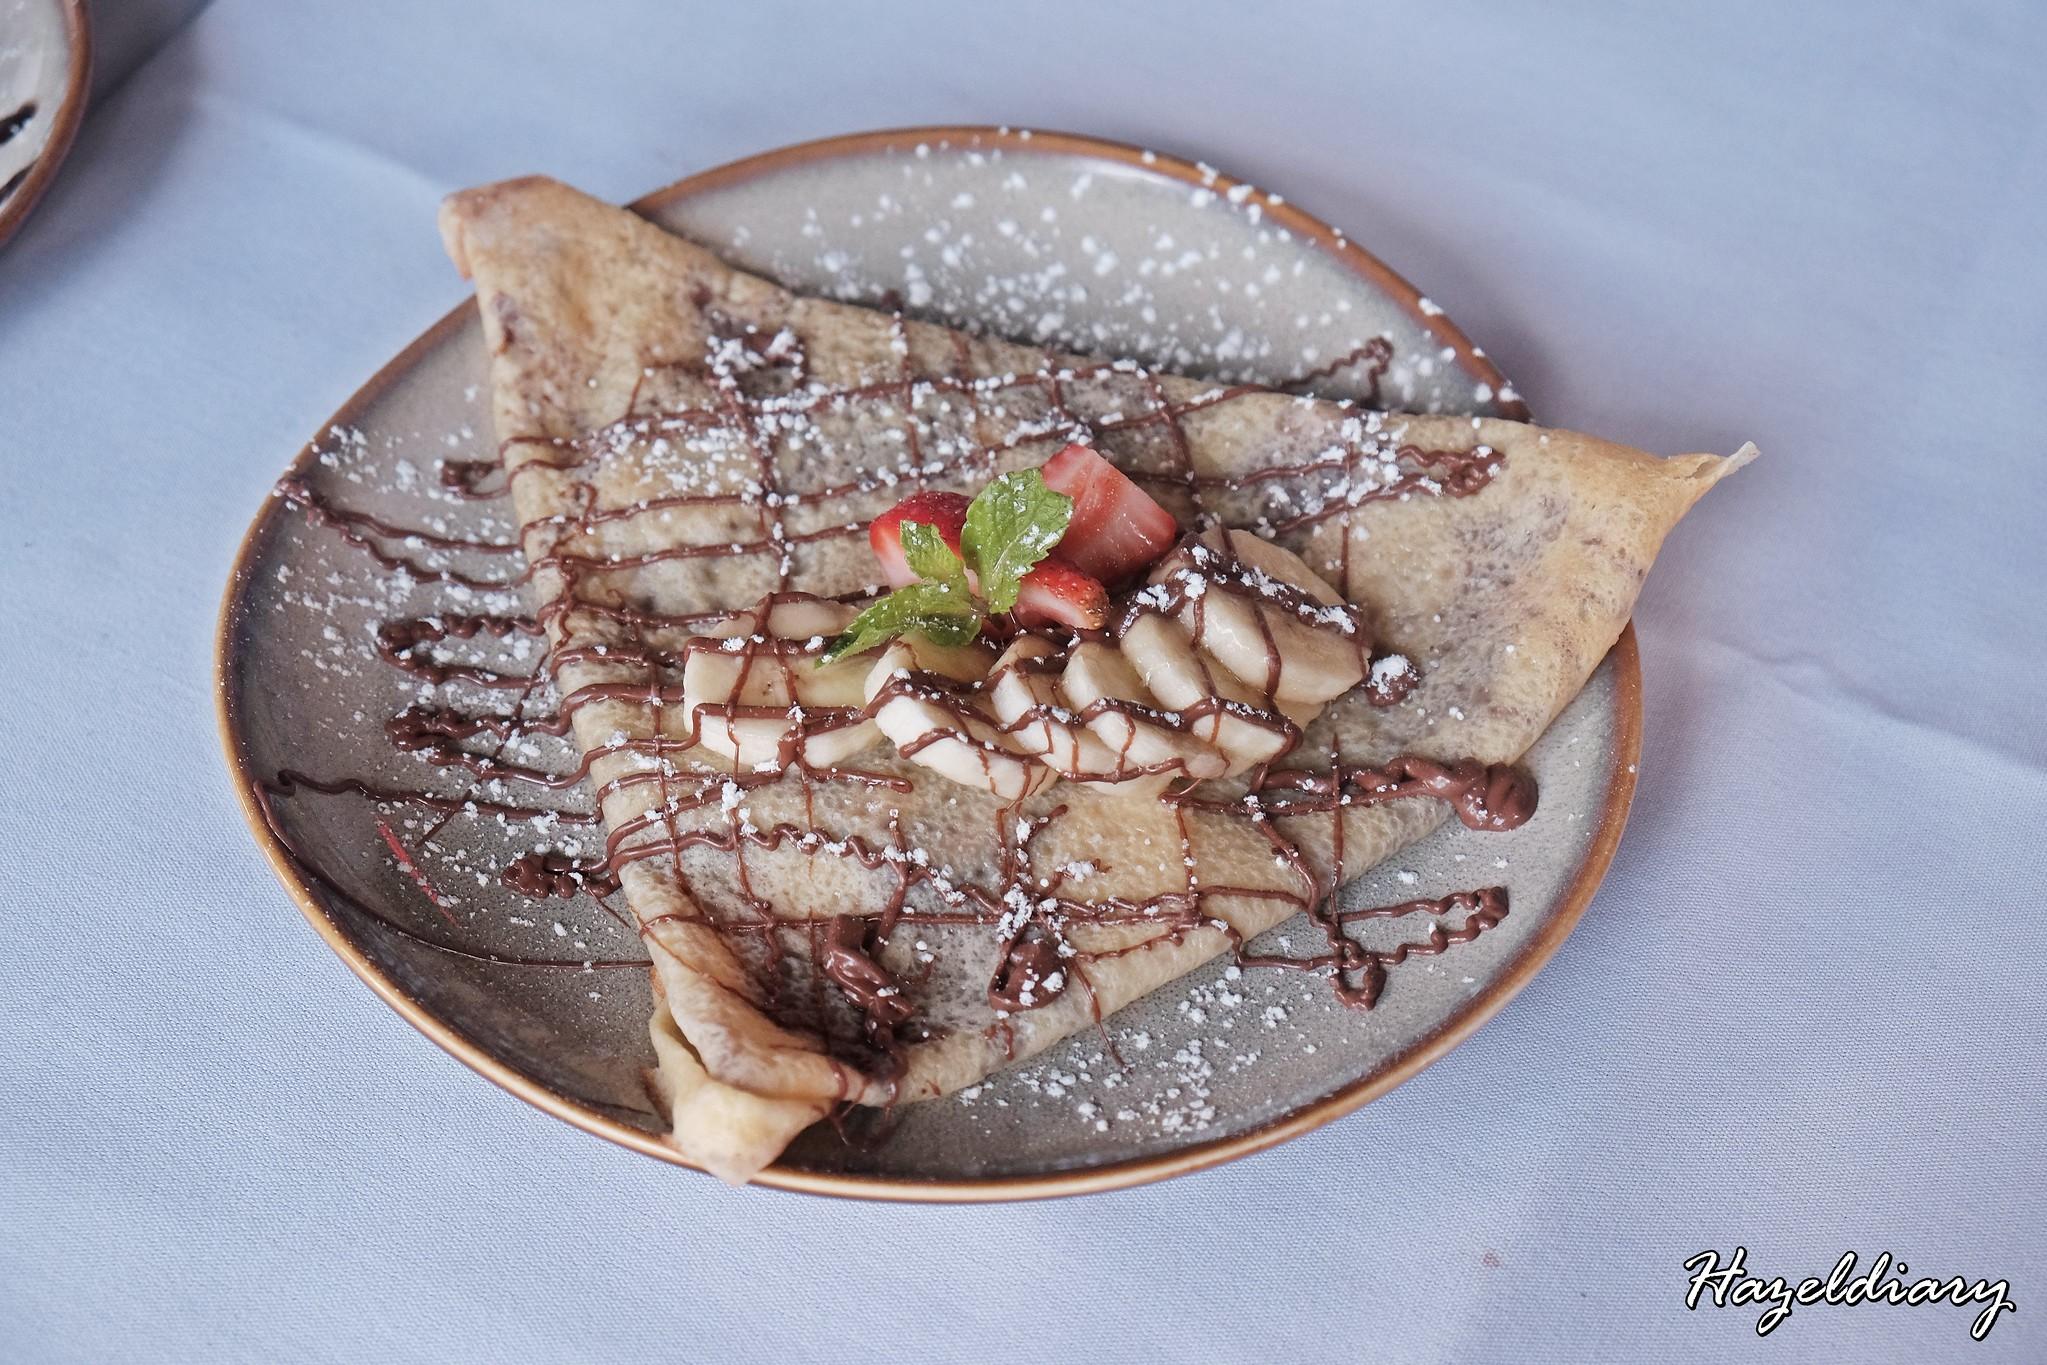 Les Bouchons Rive Gauche-crepe with nutella